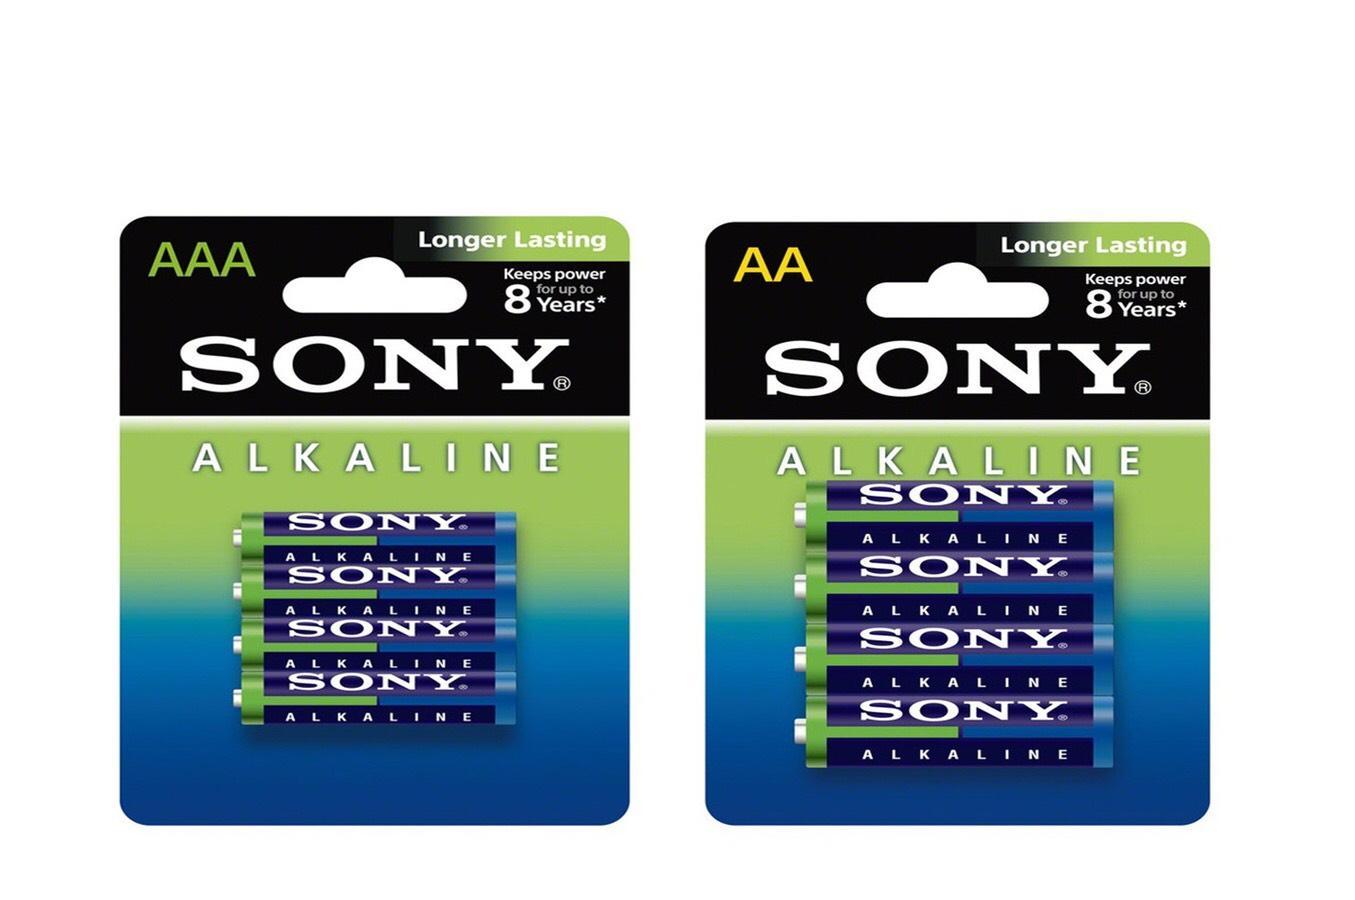 Pack de 60 piles Sony (32 AA + 28 AAA)